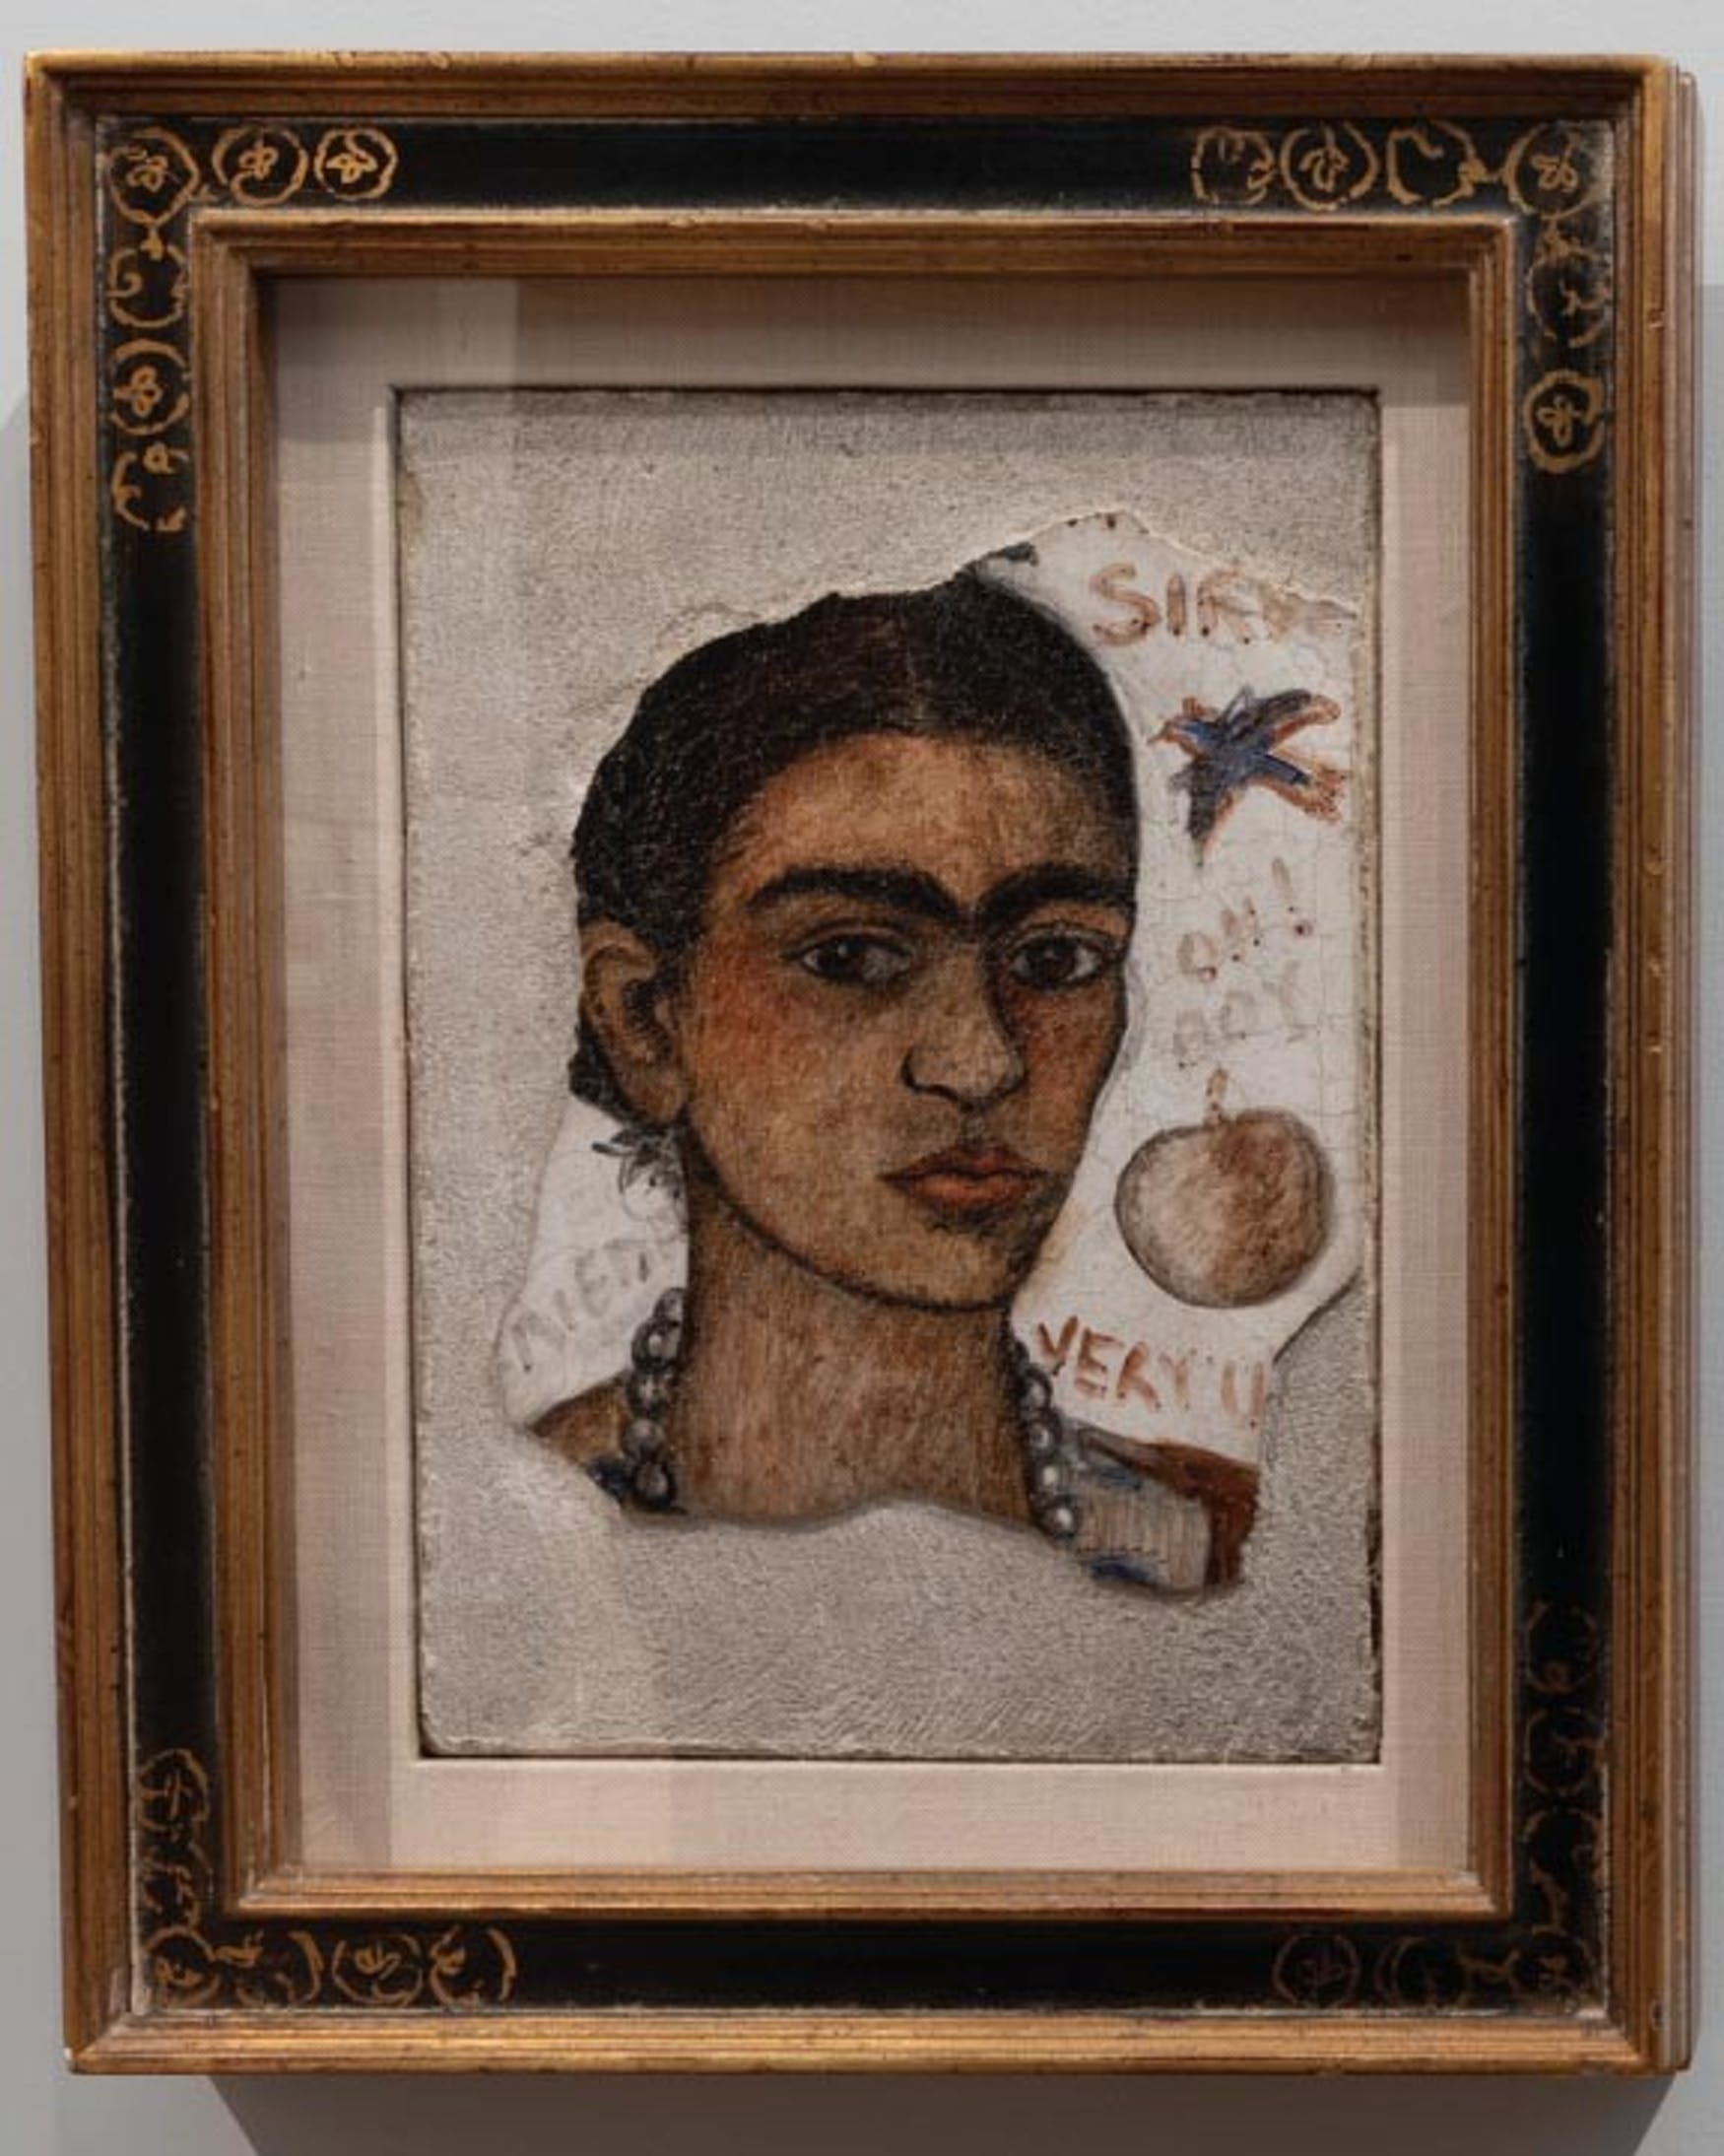 Frida Kahlo, Self Portrait (Very Ugly), 1933.